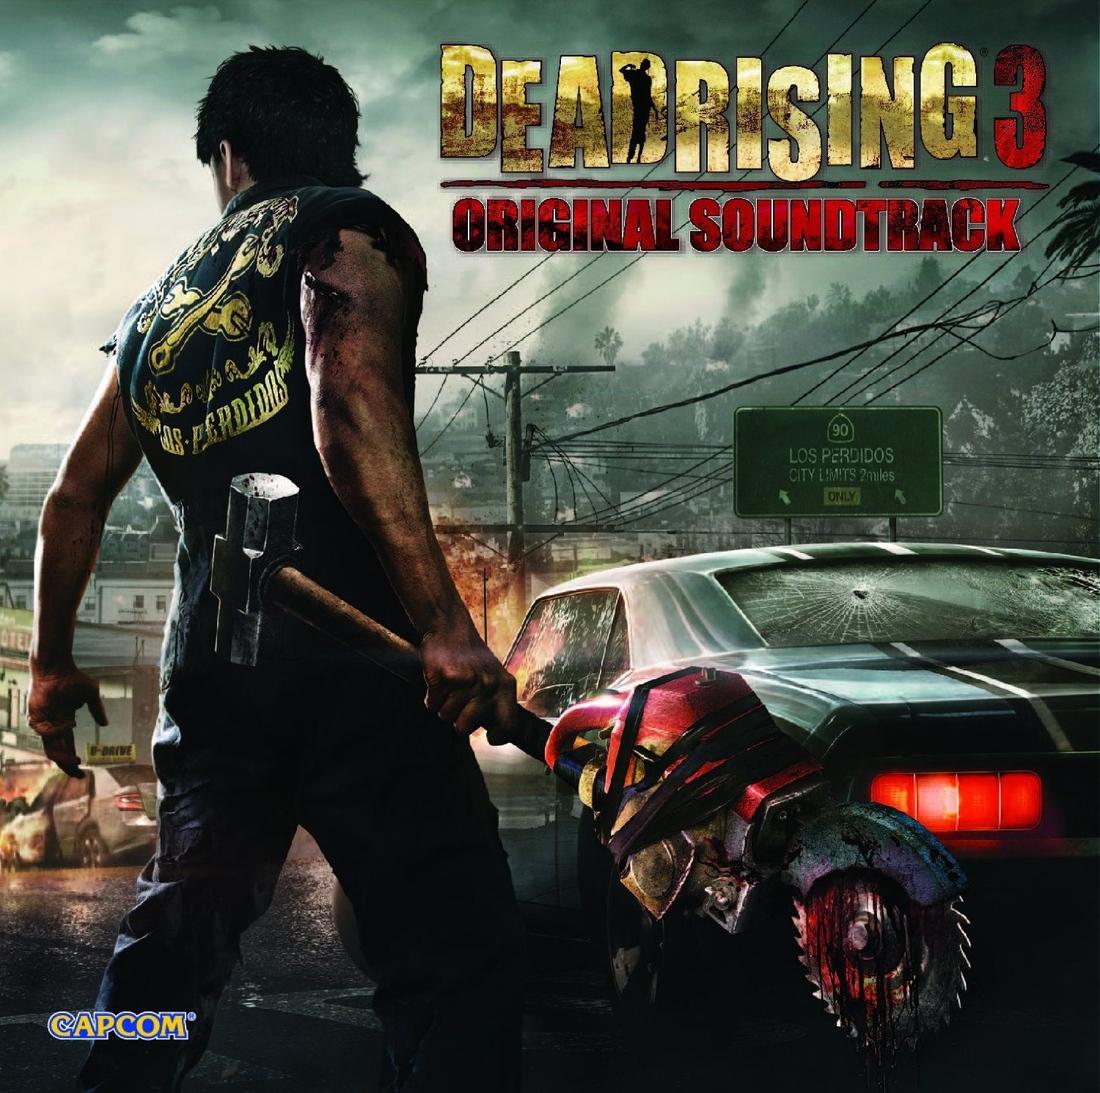 Get 10 tracks form Dead Rising 3's soundtrack free